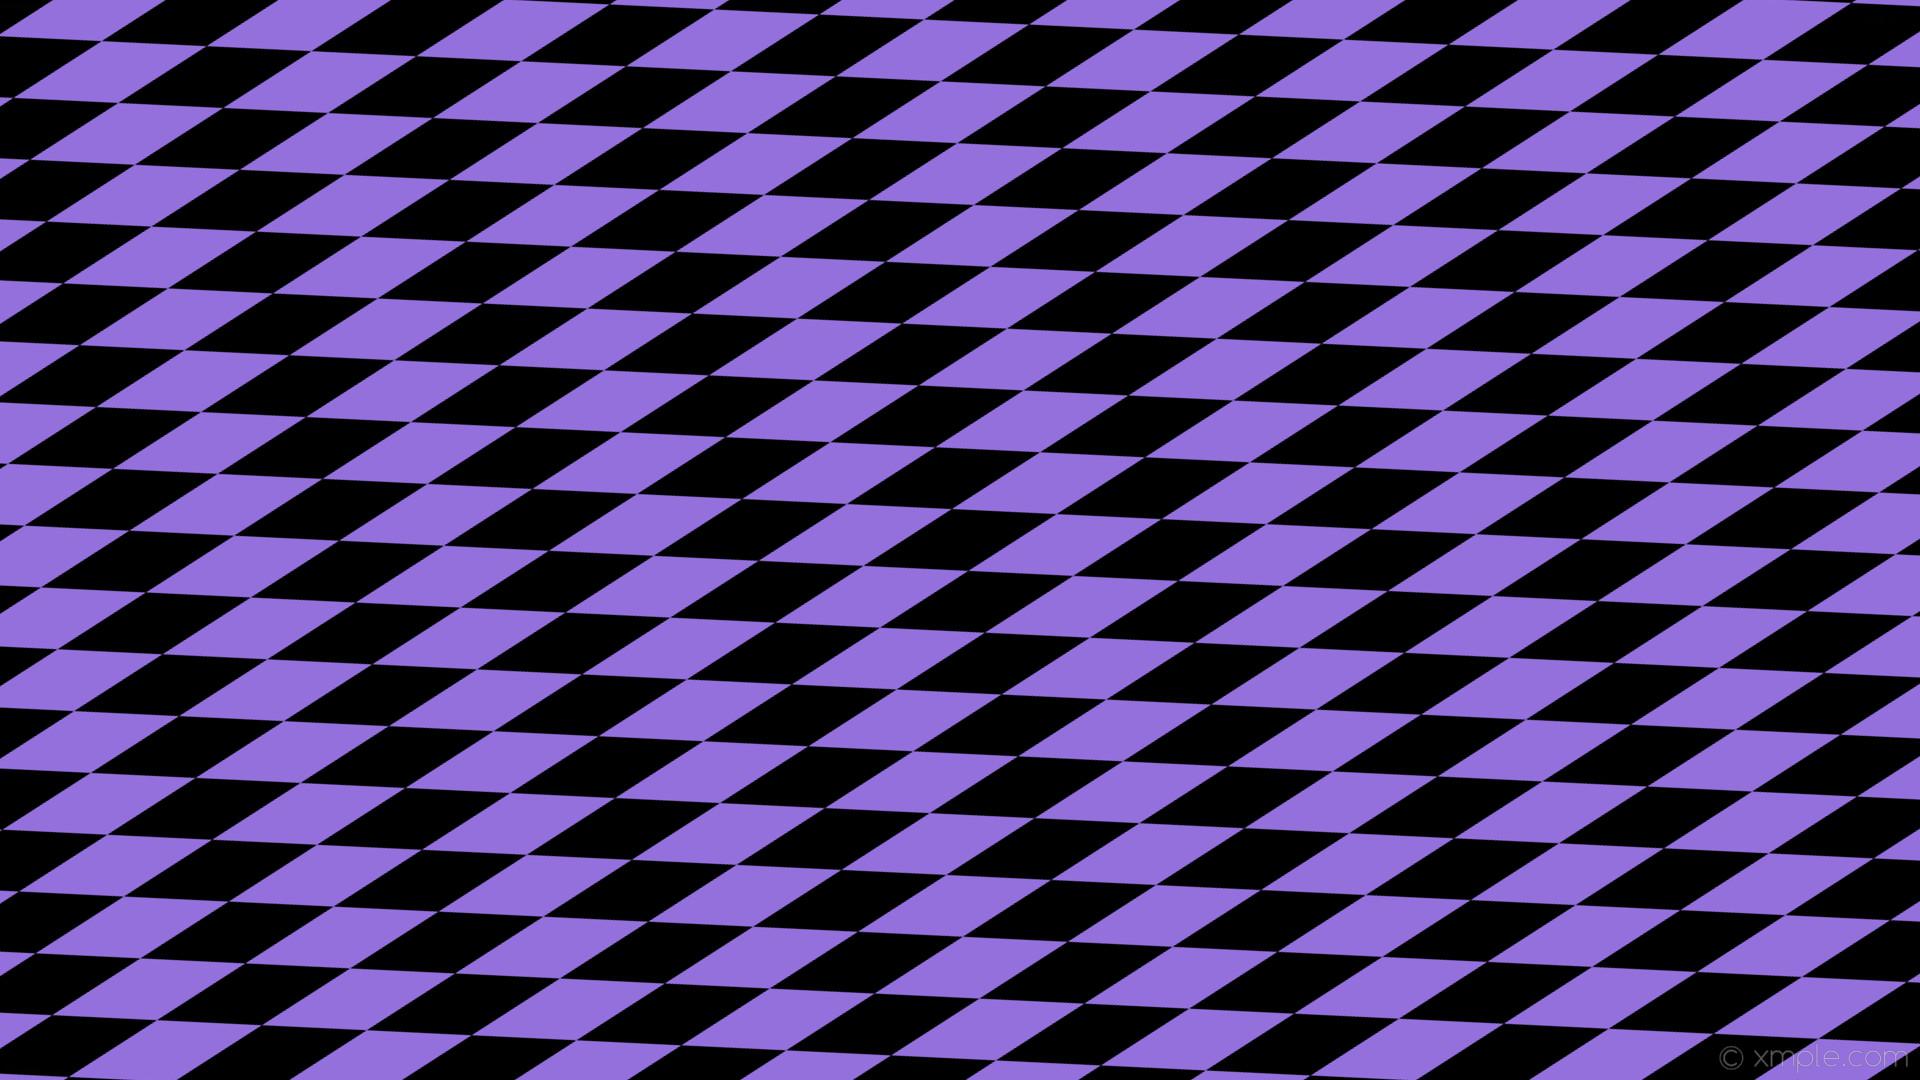 wallpaper rhombus purple black diamond lozenge medium purple #000000  #9370db 15° 200px 64px